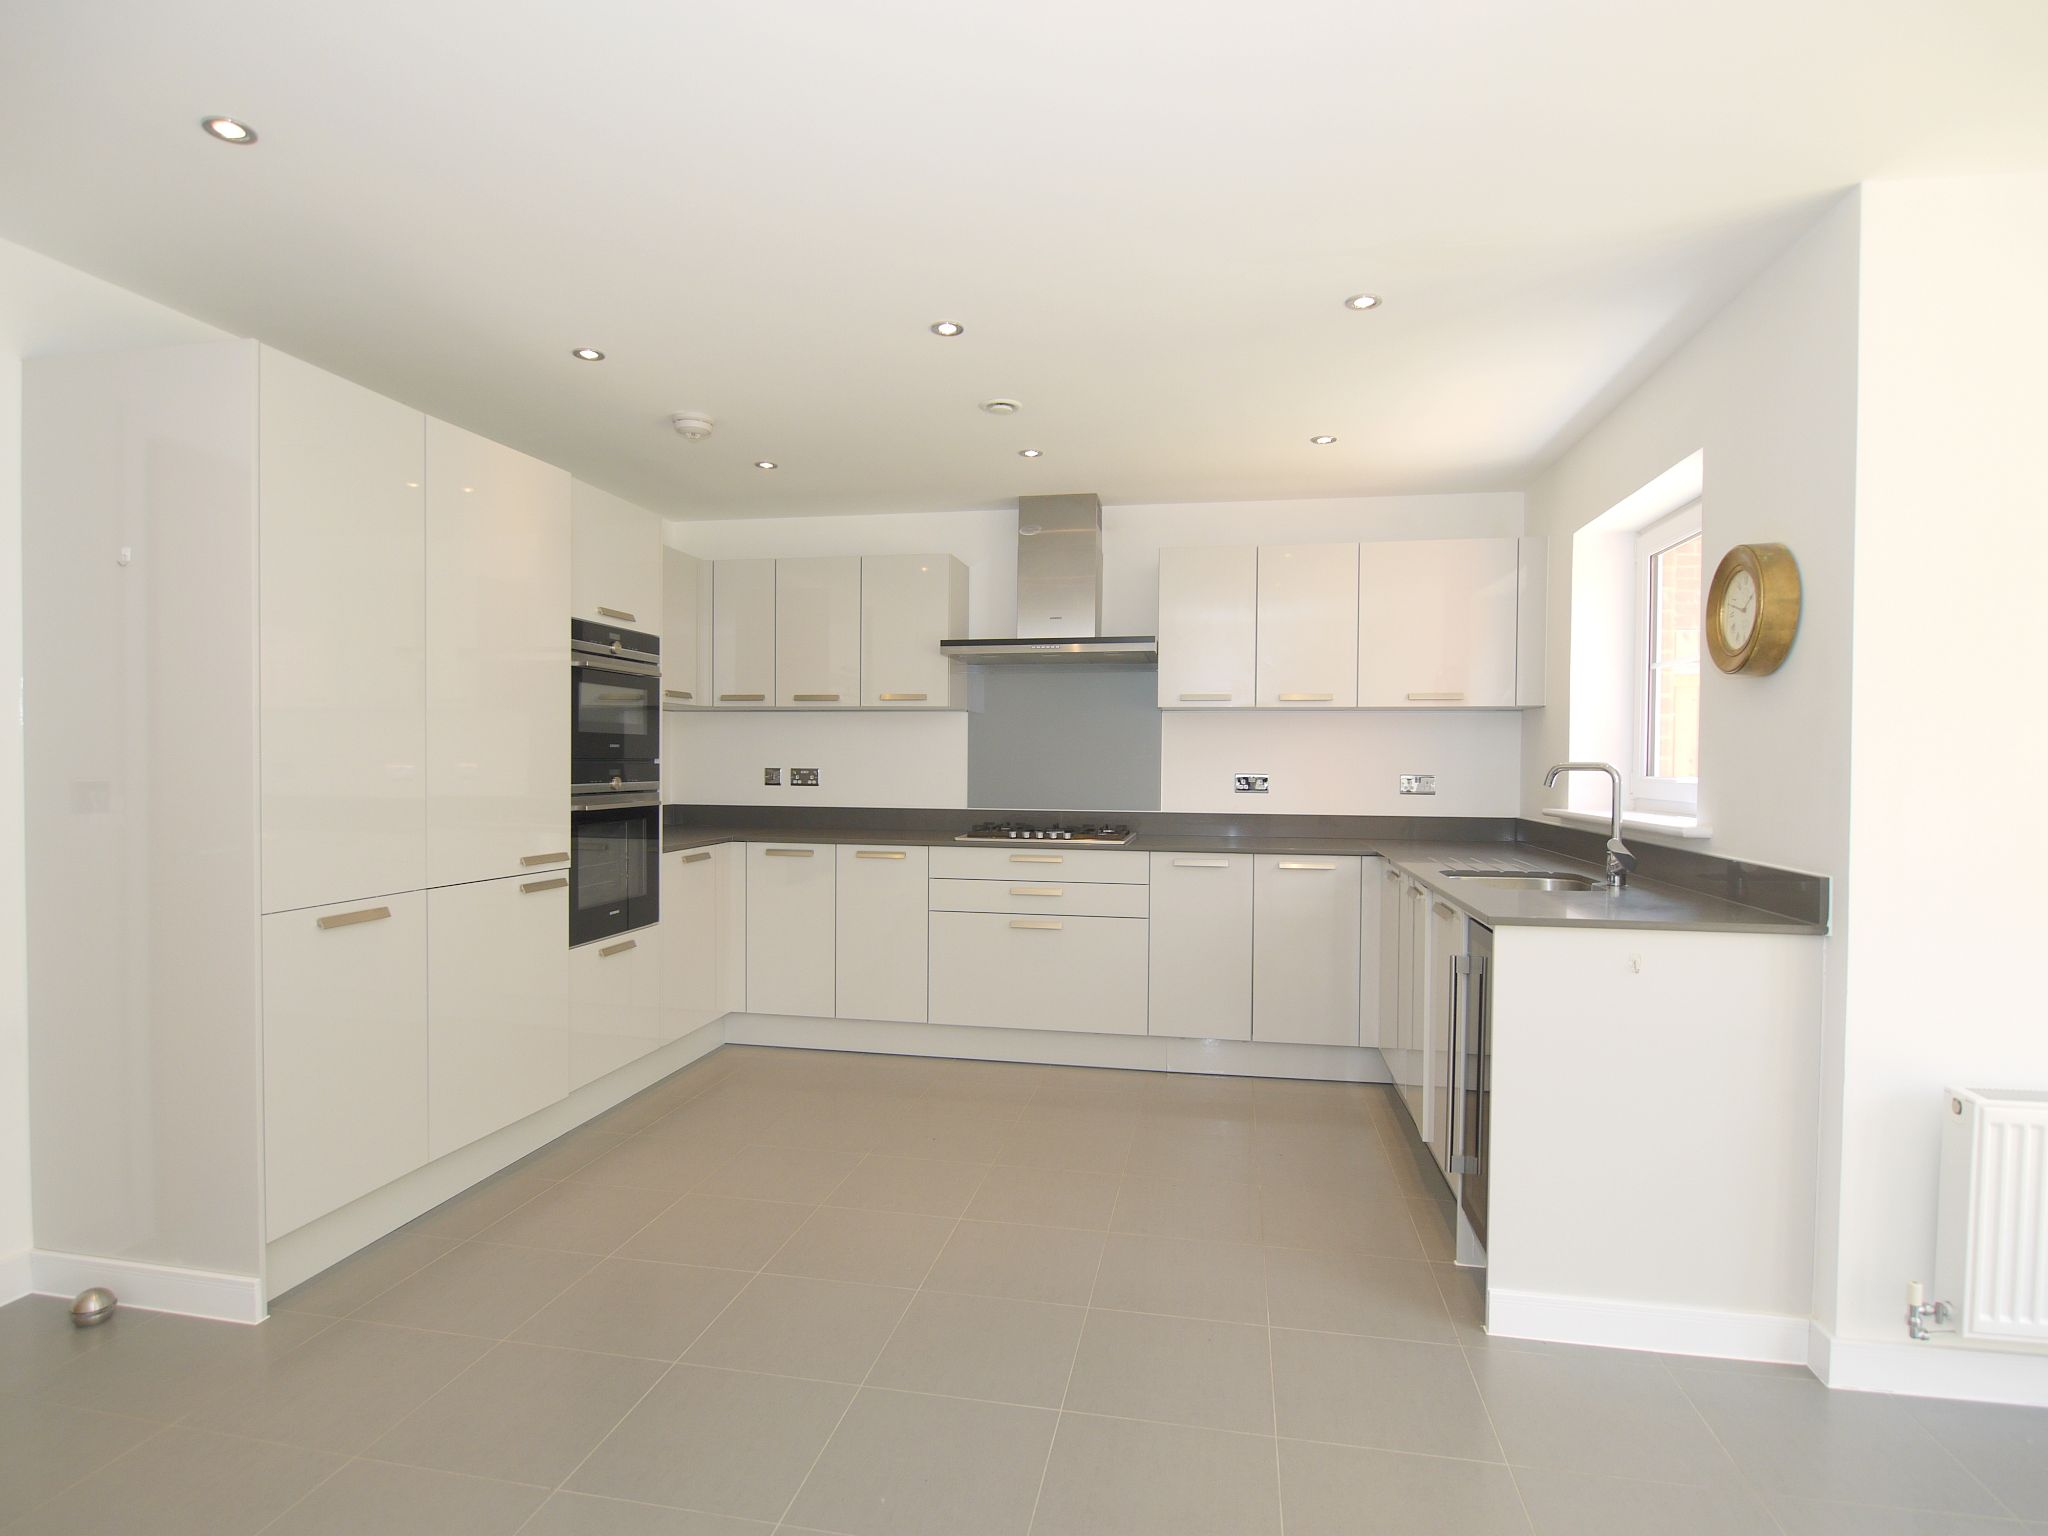 4 bedroom mid terraced house For Sale in Sevenoaks - Photograph 3